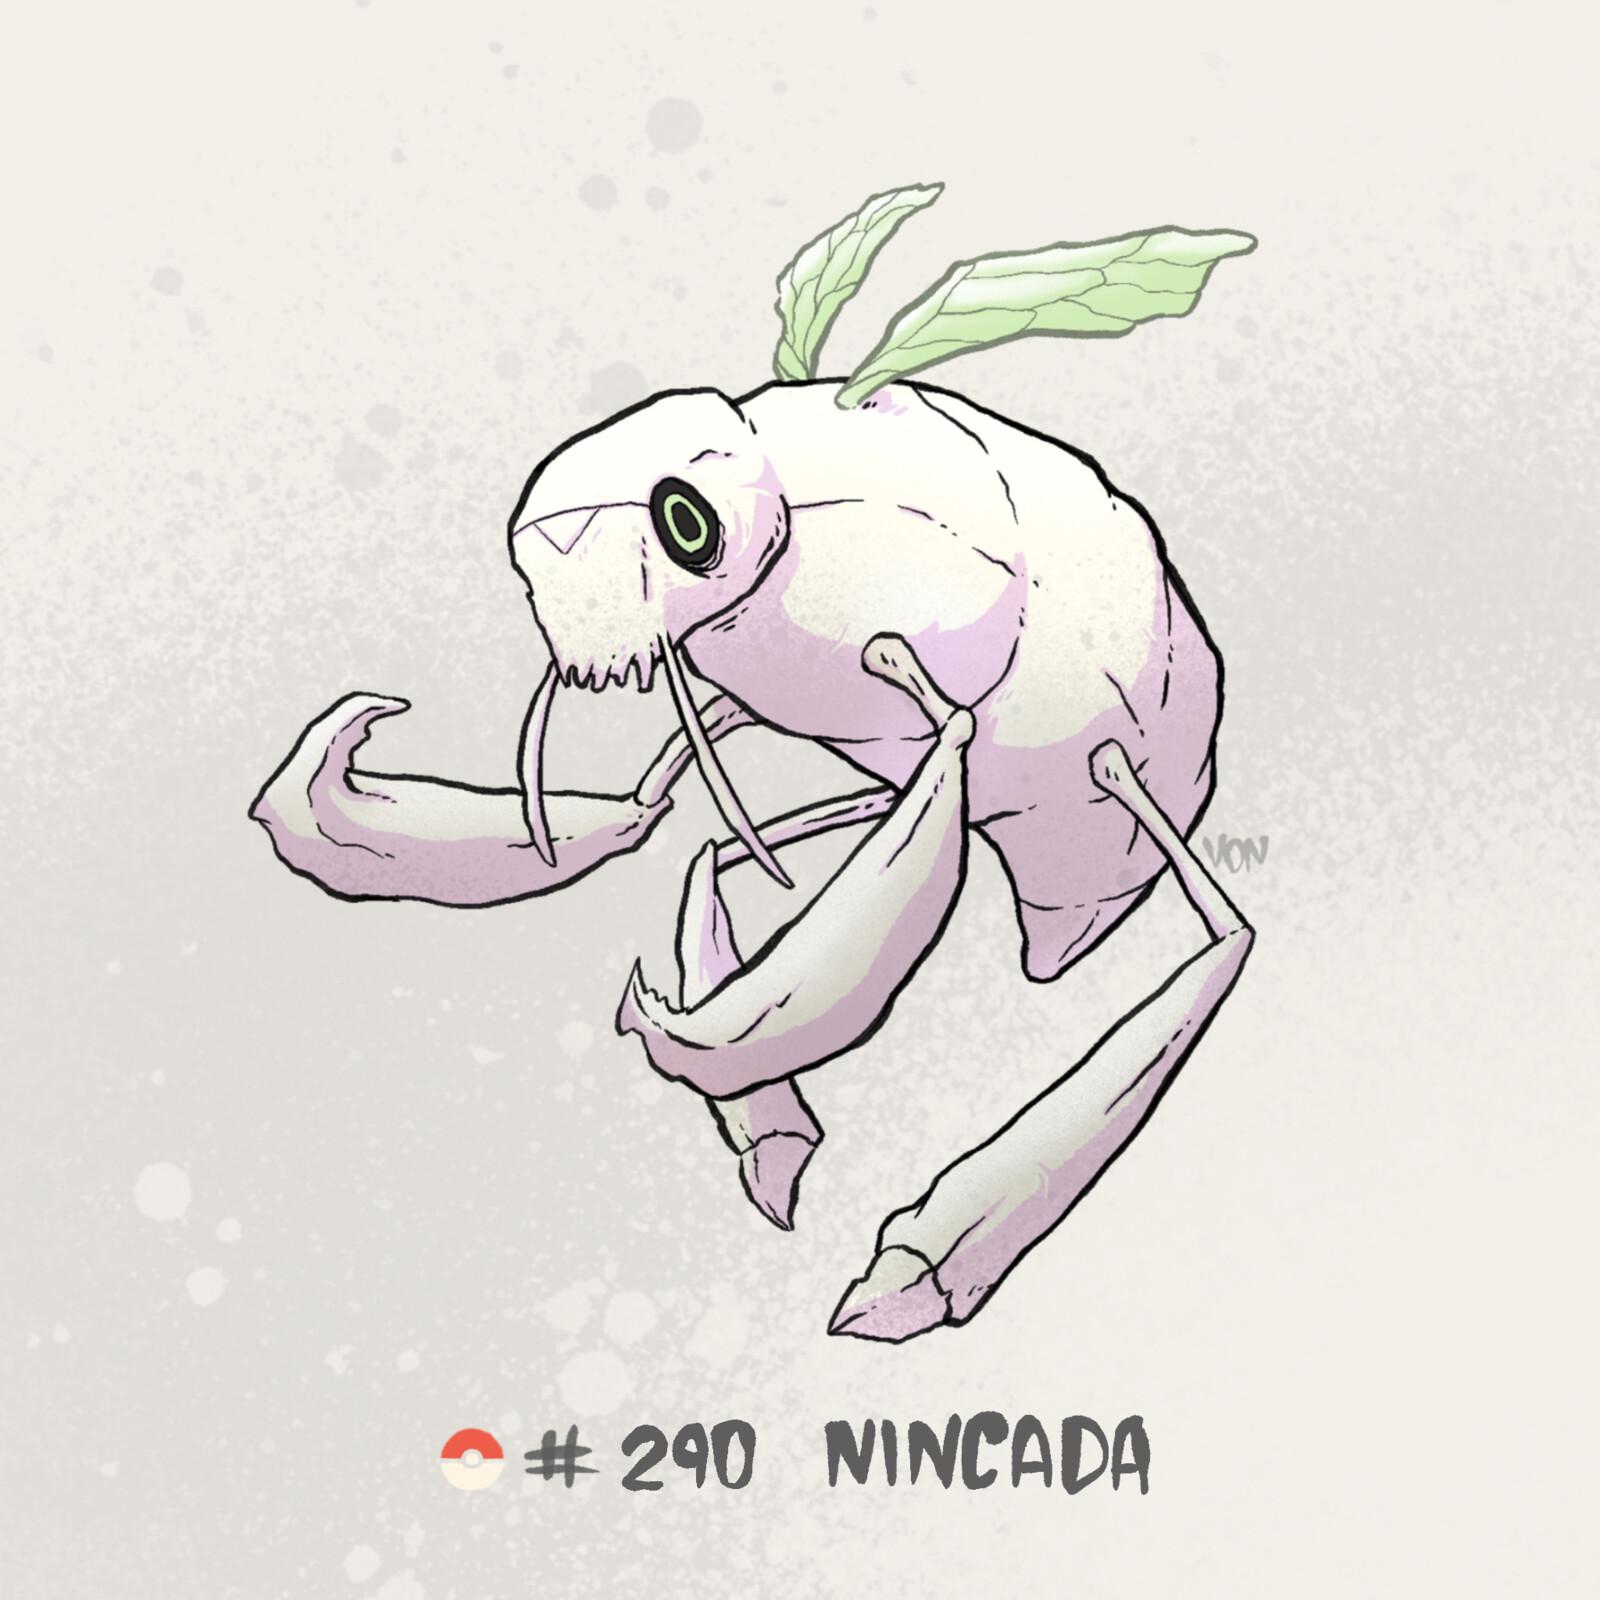 #290 Nincada